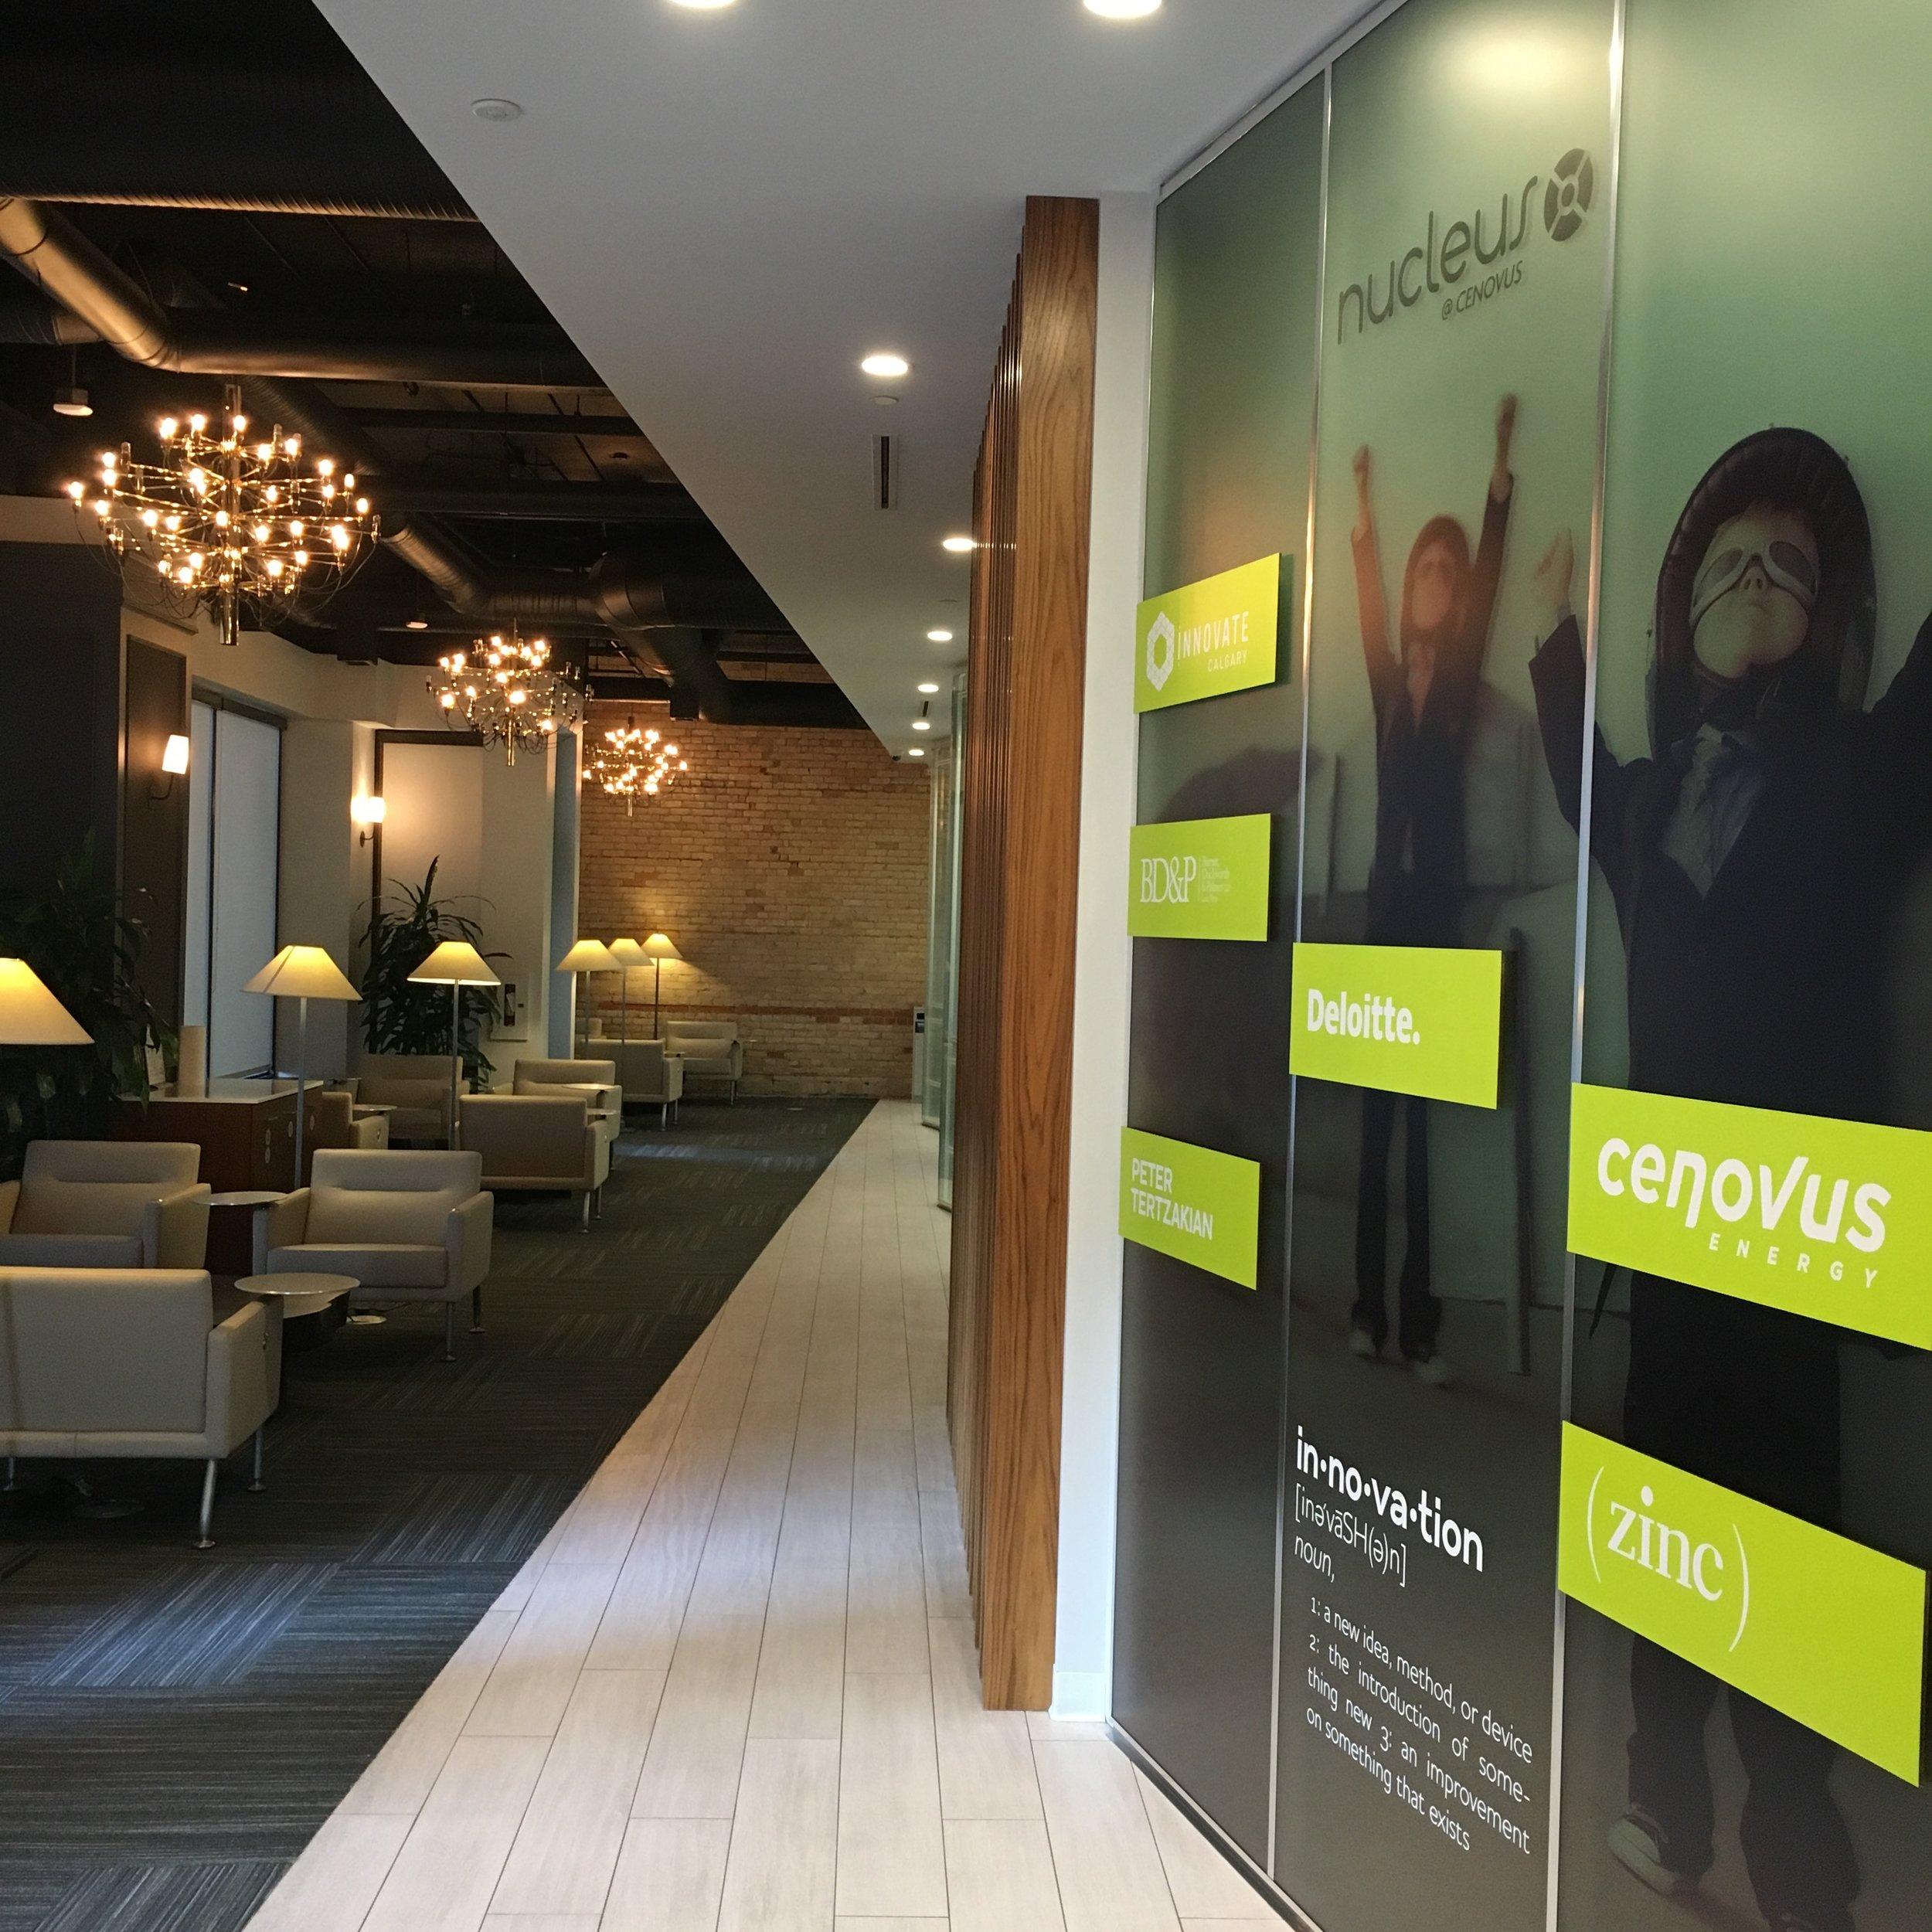 Foyer at Nucleus Calgary, sponsored by Cenovus Energy